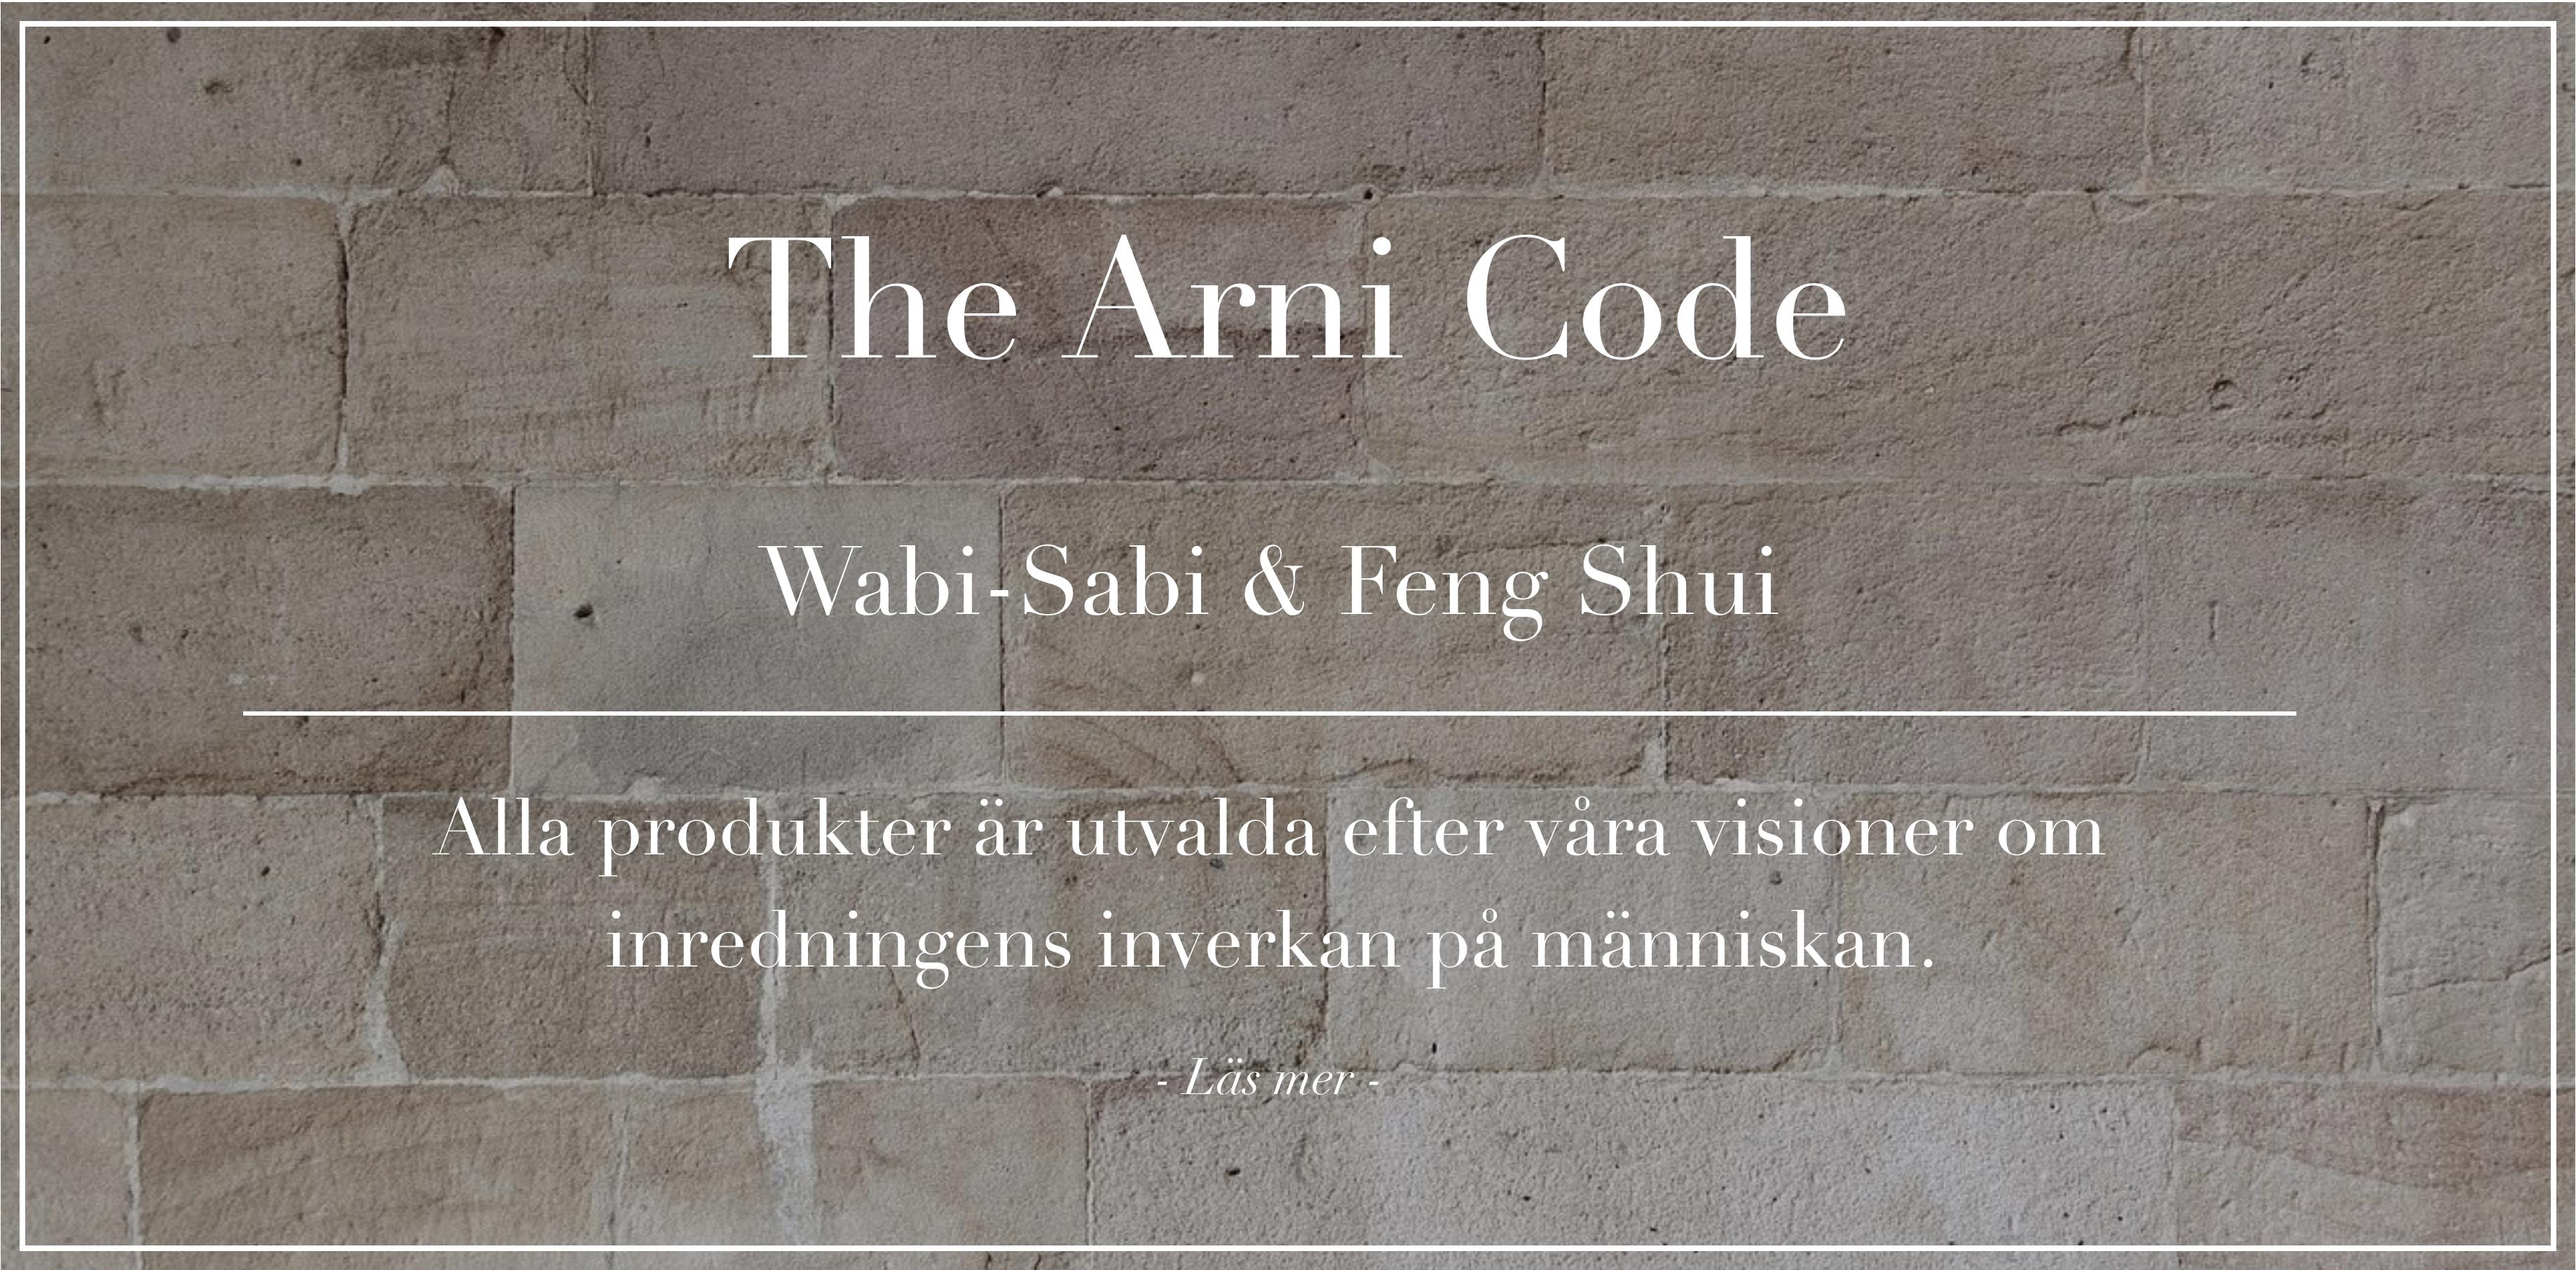 Exklusiv inredningl online, Unika material - hetaste trenderna. Inspirerat av Wabi-Sabi & Feng Shui.The Arni Concept